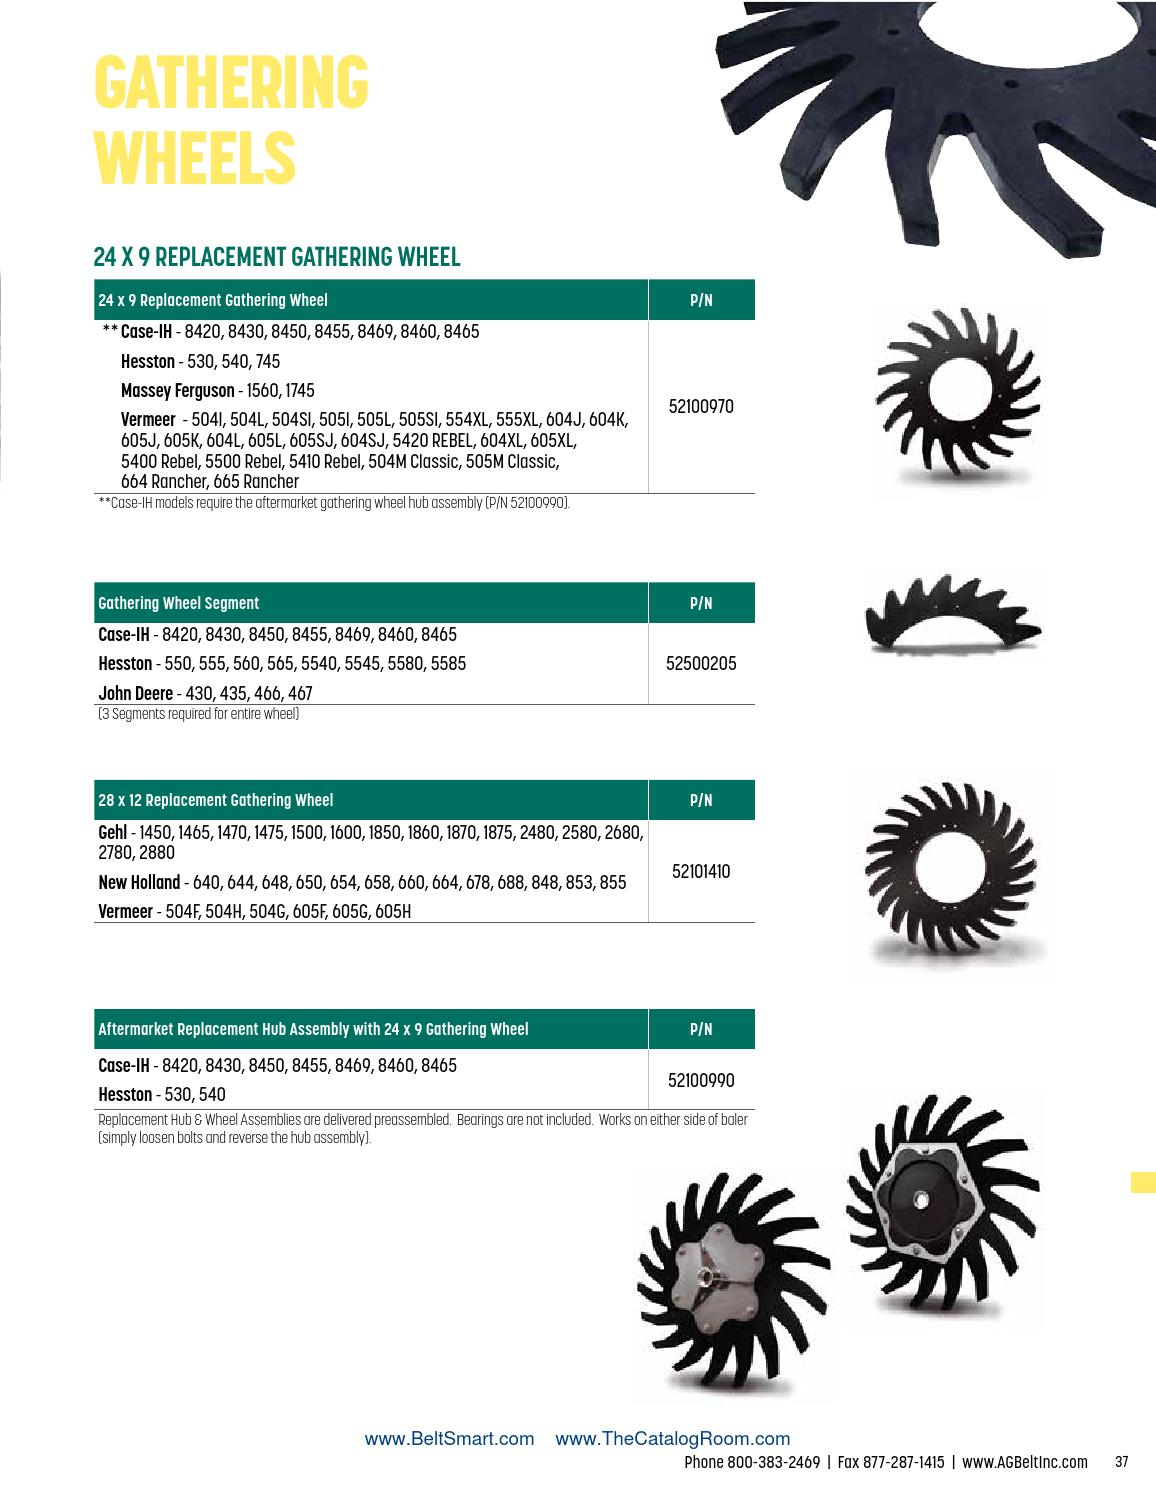 Apache Trico Baler belt beltsmart com by Murdock Industrial Inc  - issuu